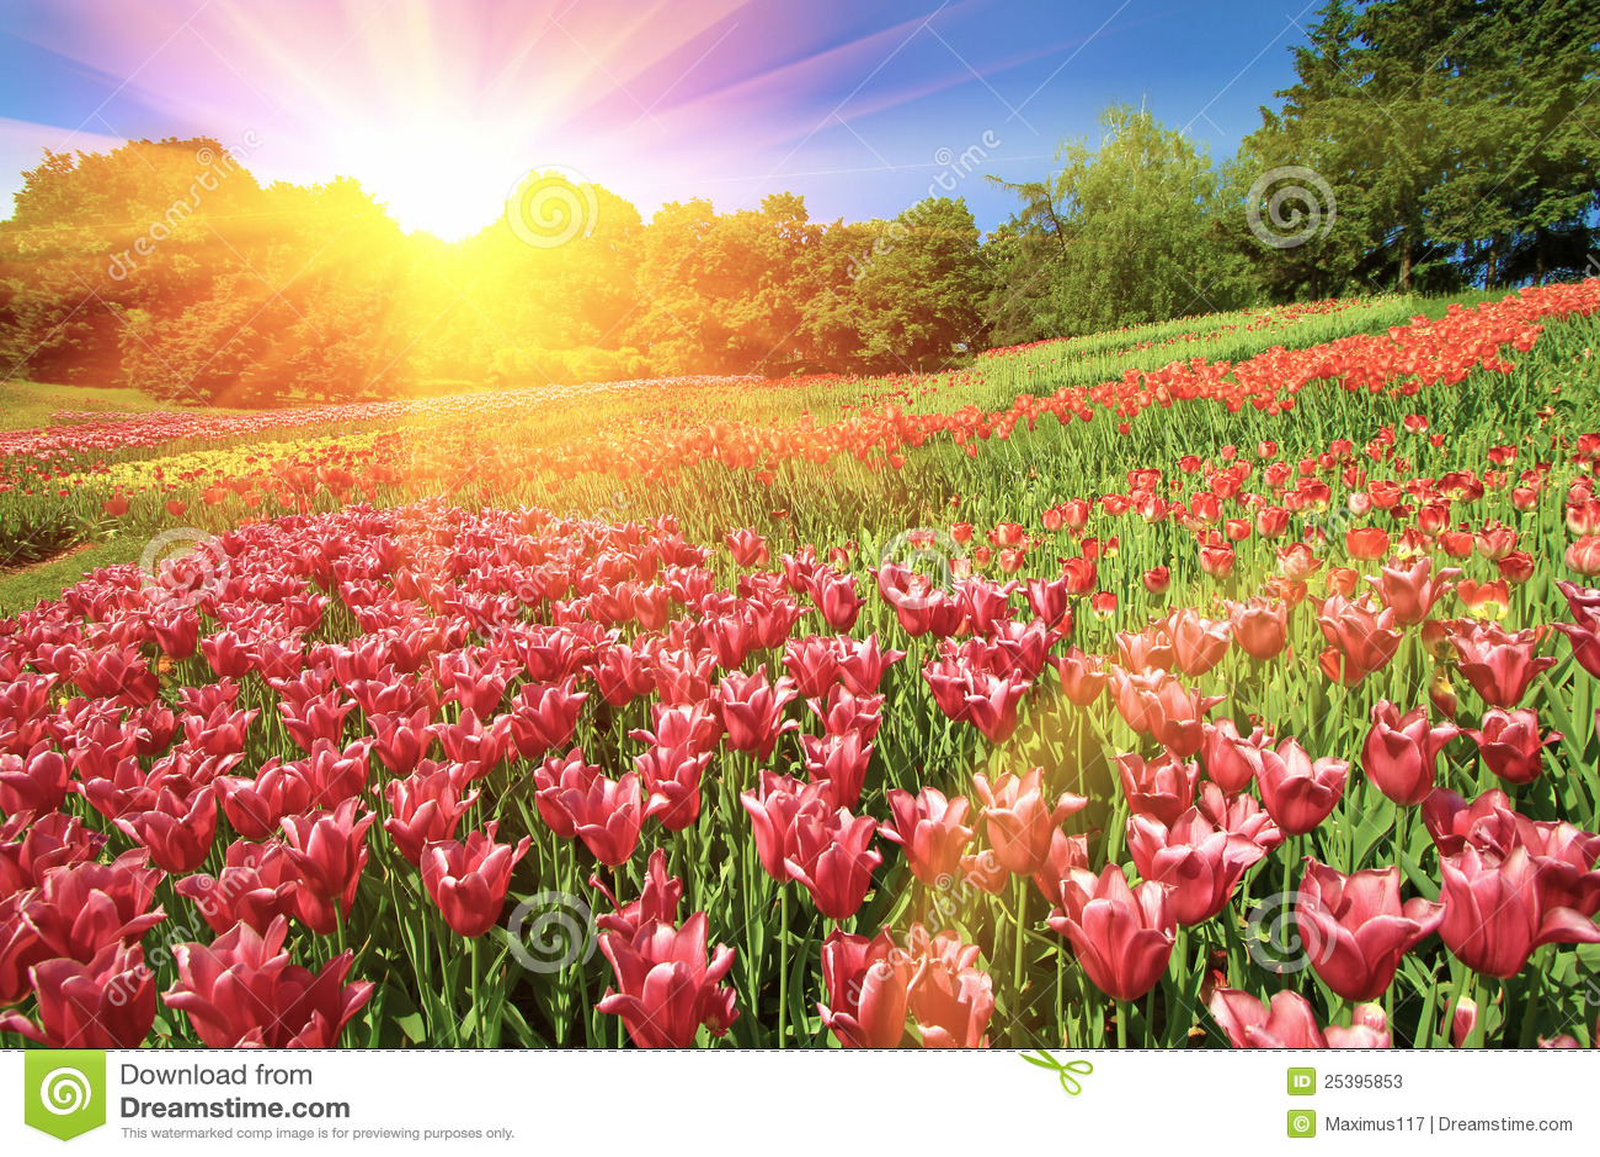 Beautiful tulips flowers field stock image image of horizontal beautiful tulips flowers field in summer day izmirmasajfo